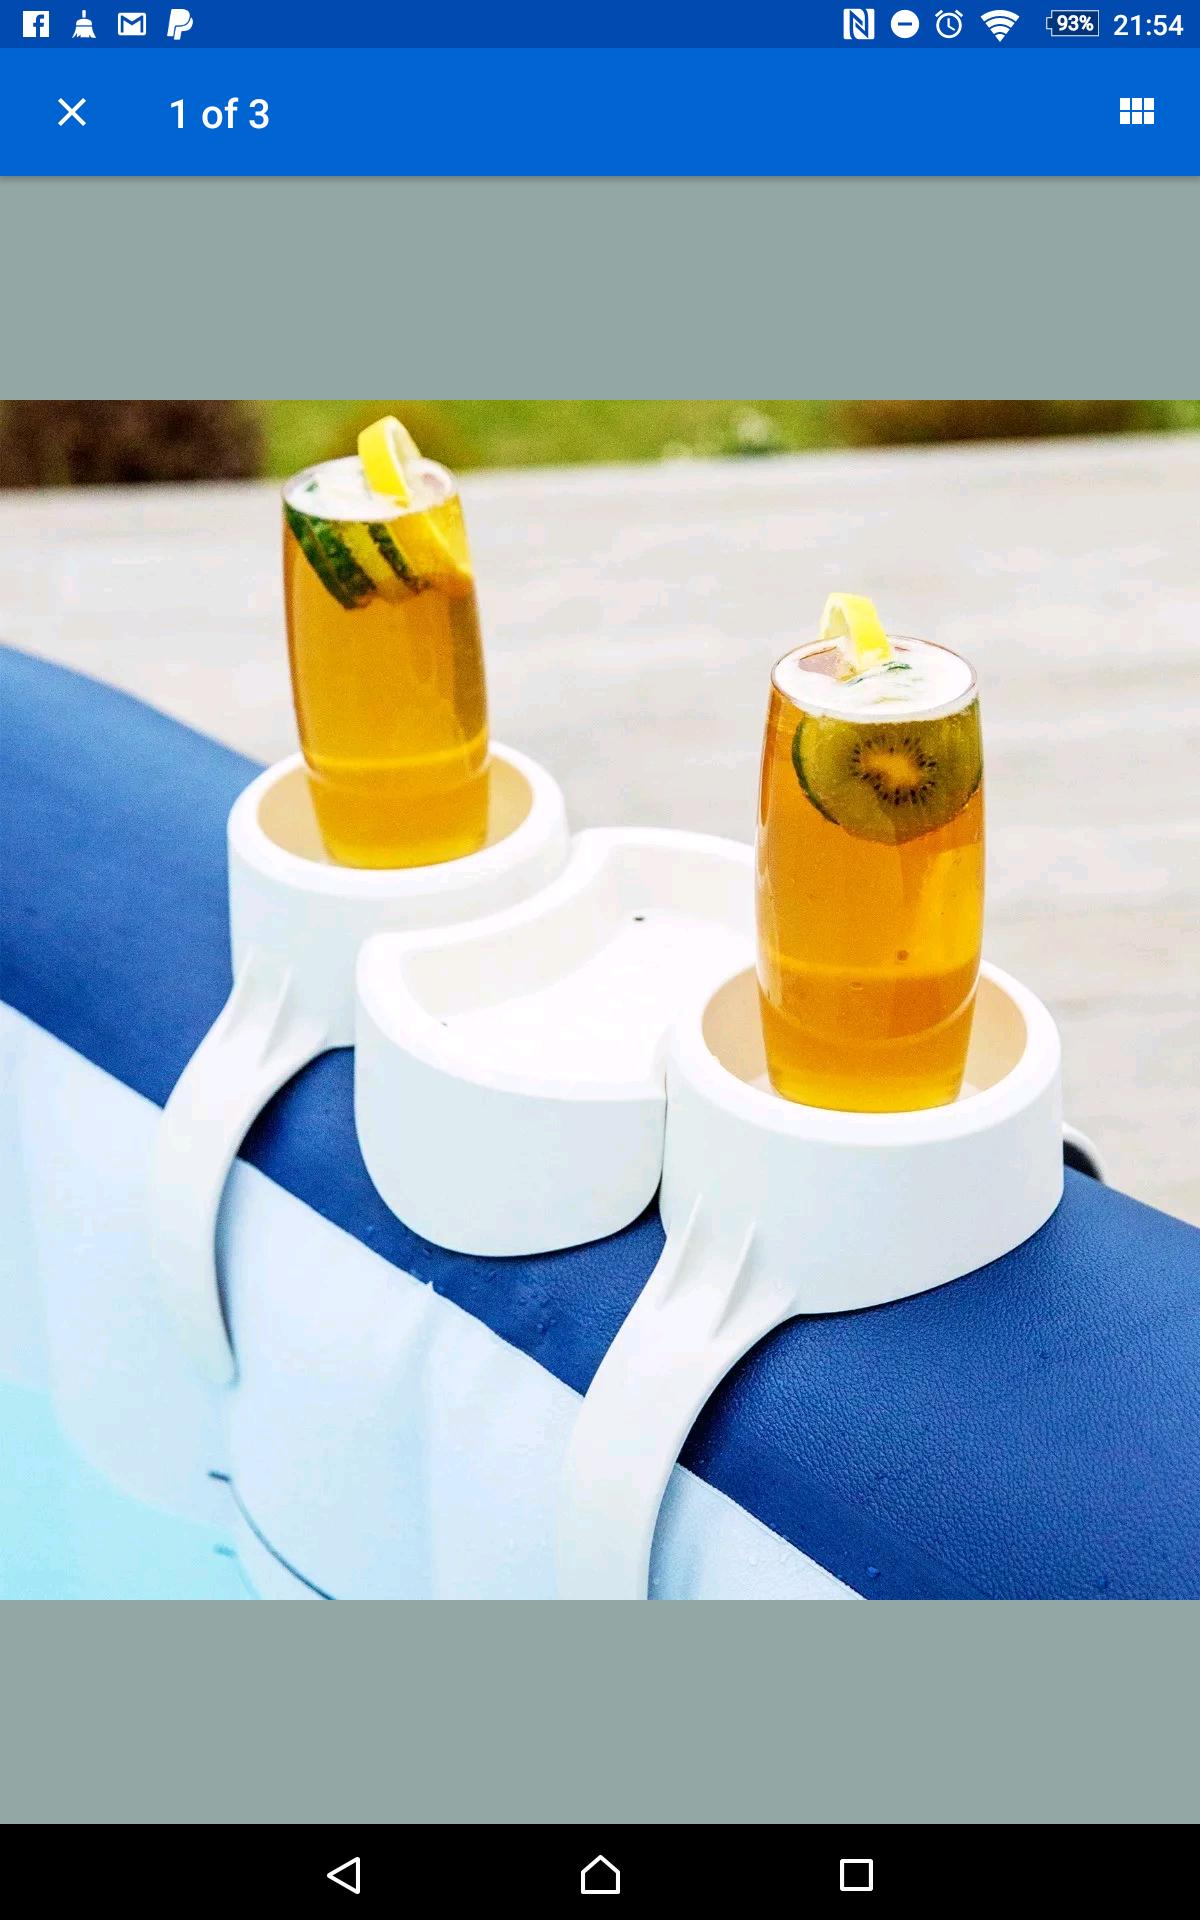 Lay z spa drinks holder,  hot tub drinks holder - £11.94 via eBay (seller ppretail)